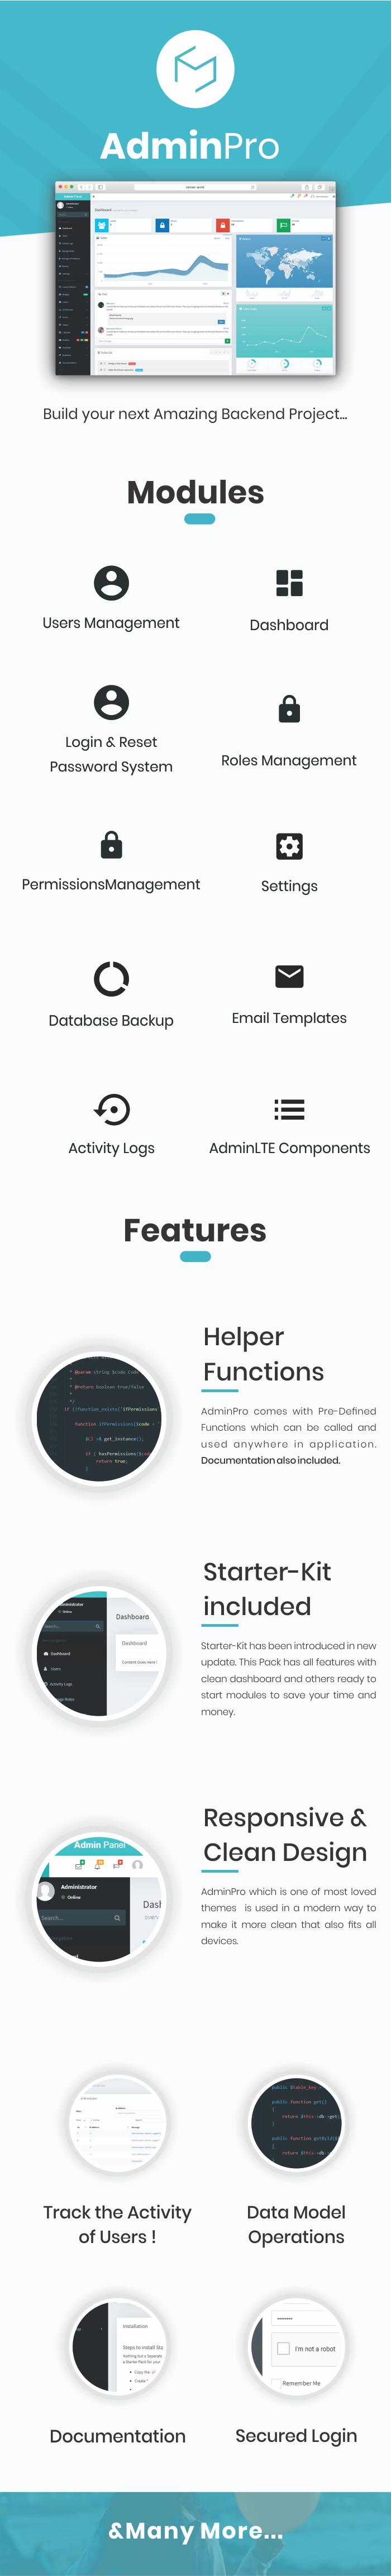 AdminPro - Login + Users & Roles Management + AdminLTE + Codeigniter Download